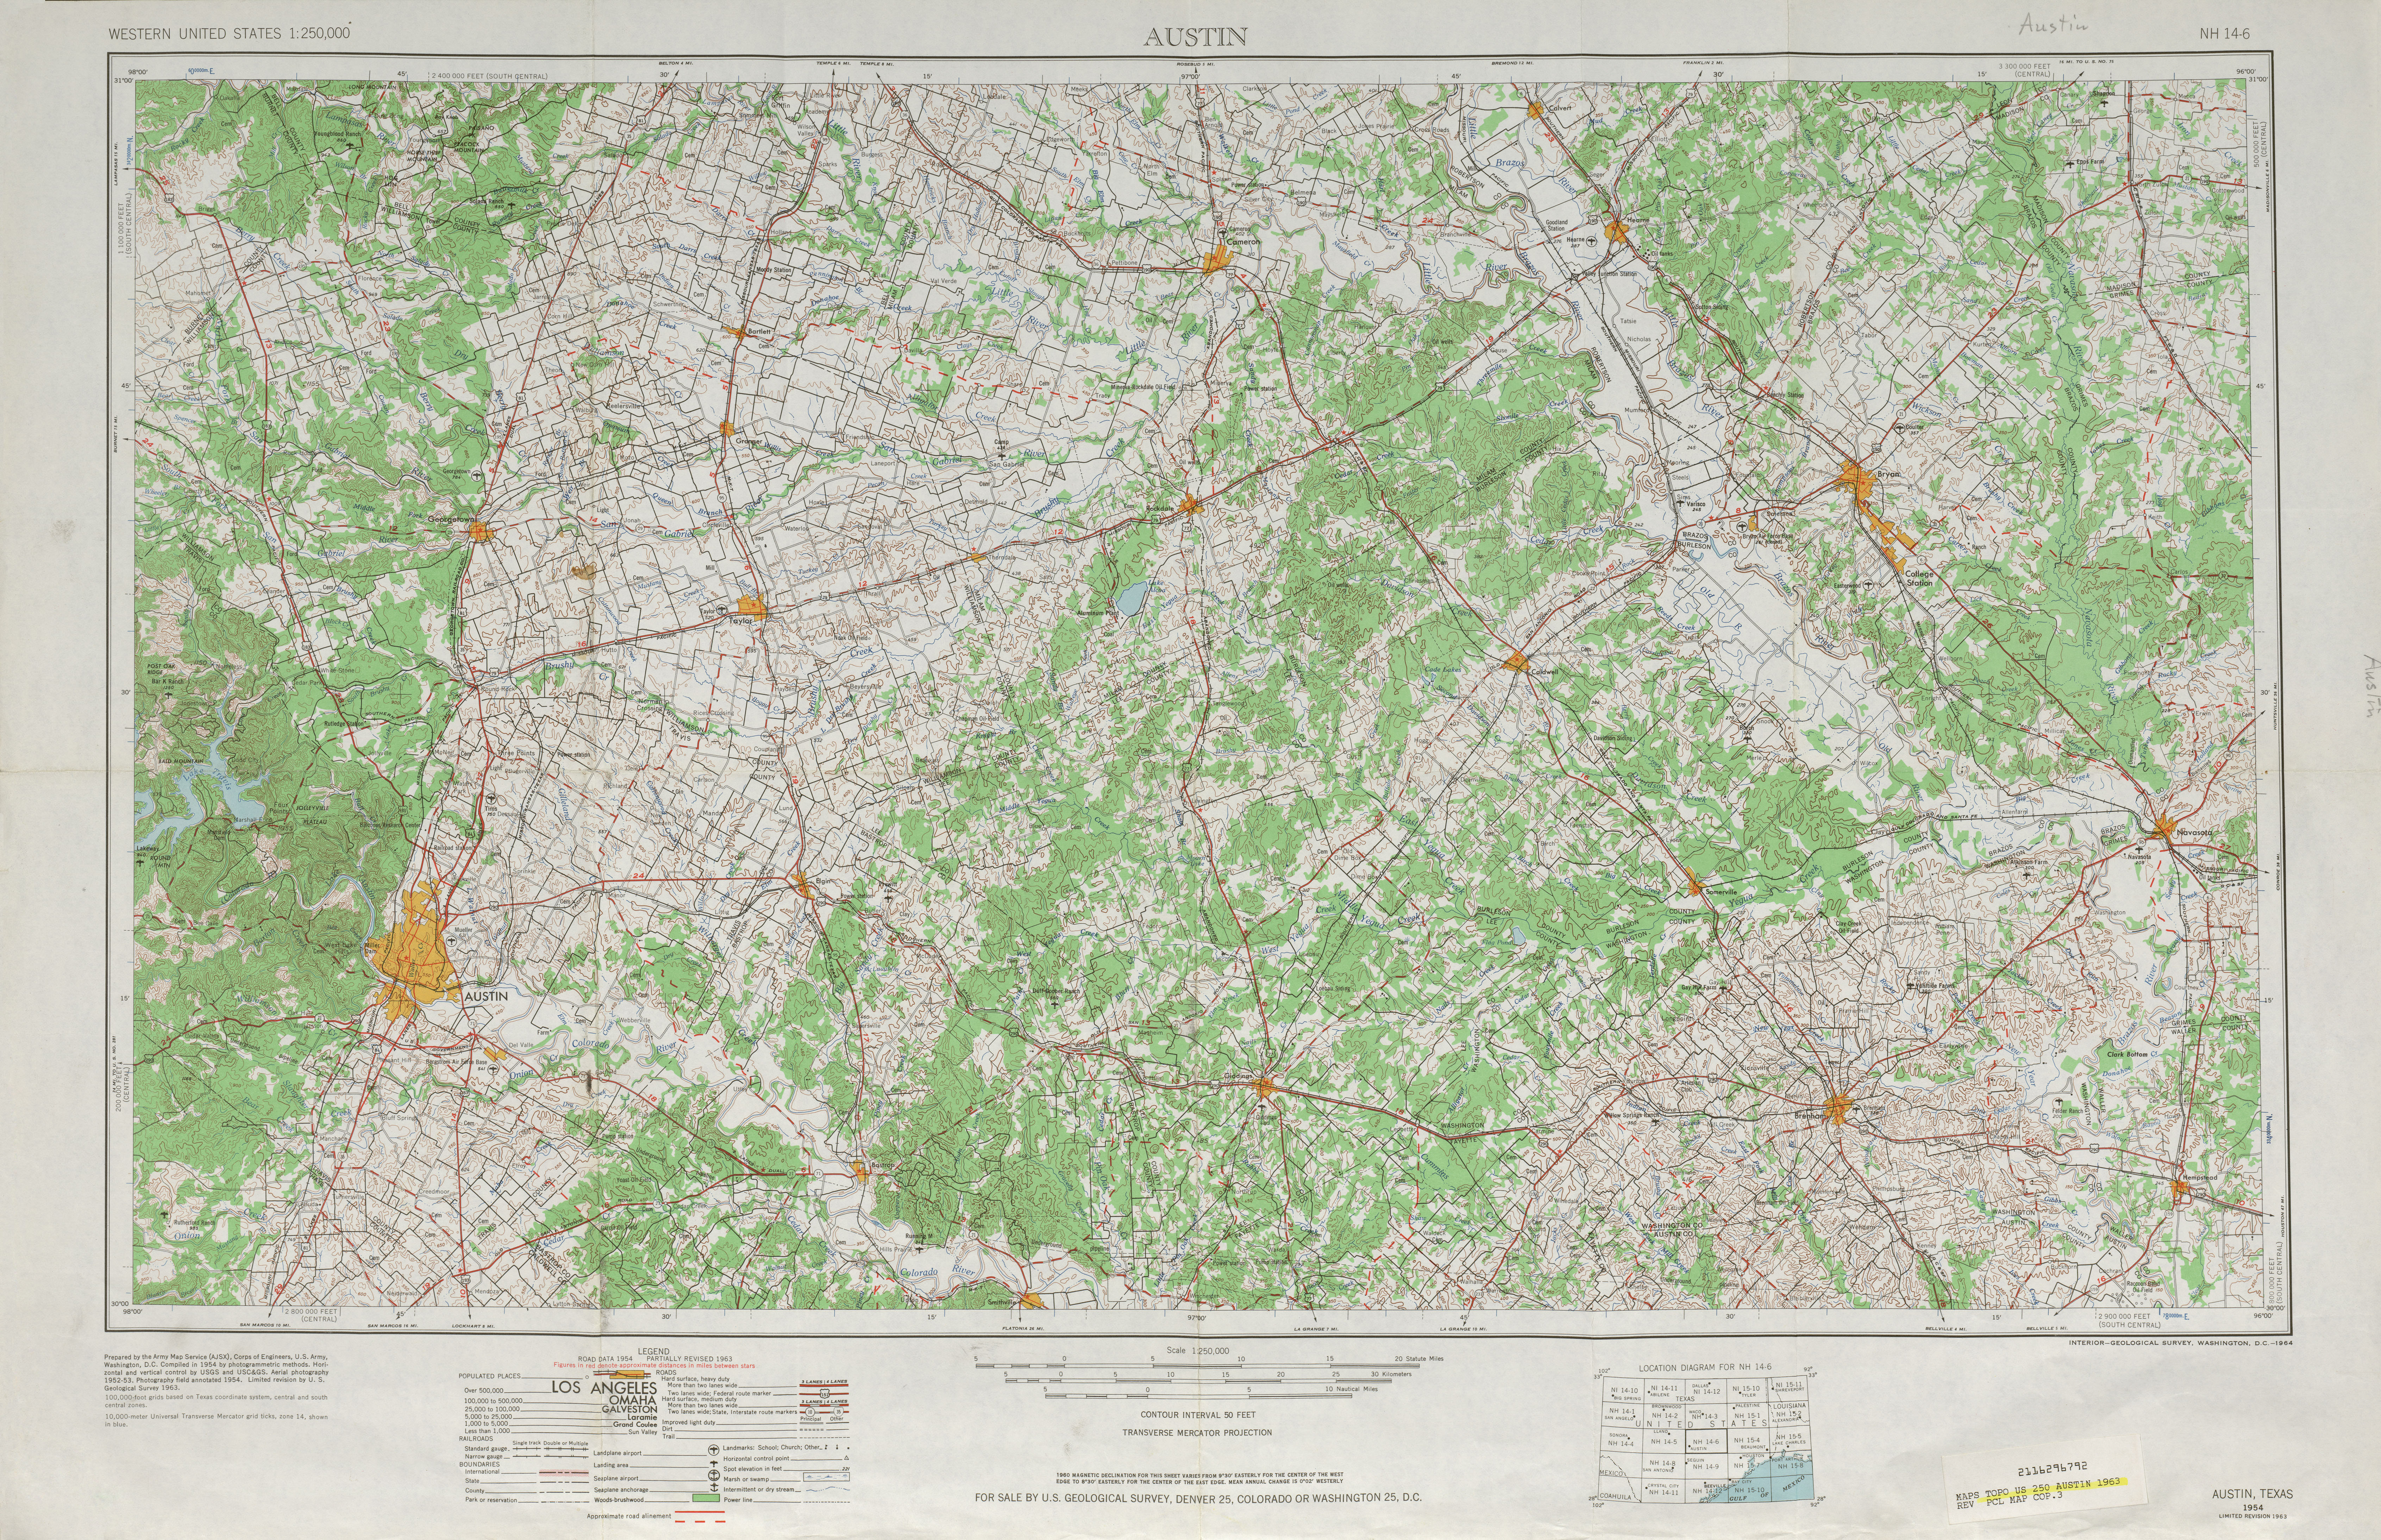 Austin Topographic Map Sheet, United States 1963